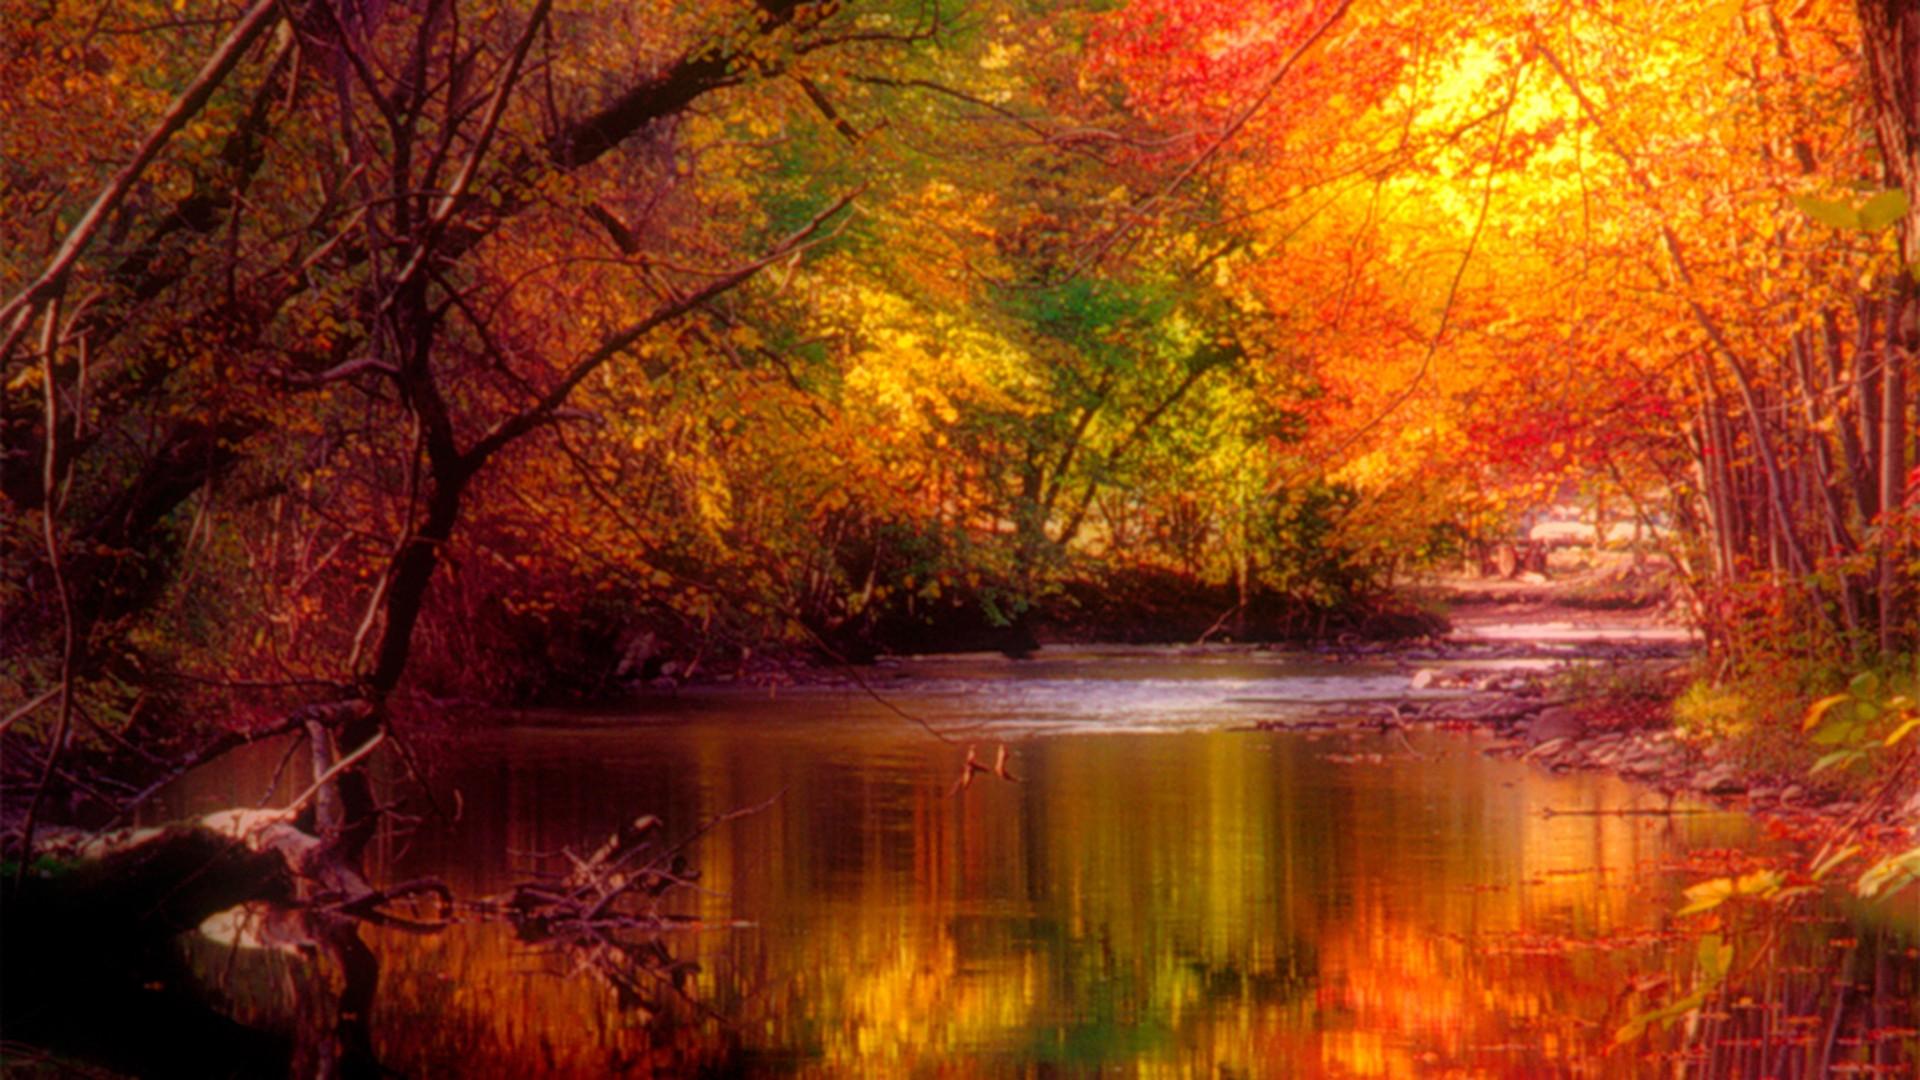 Wordless Wednesday – Autumn Reflections